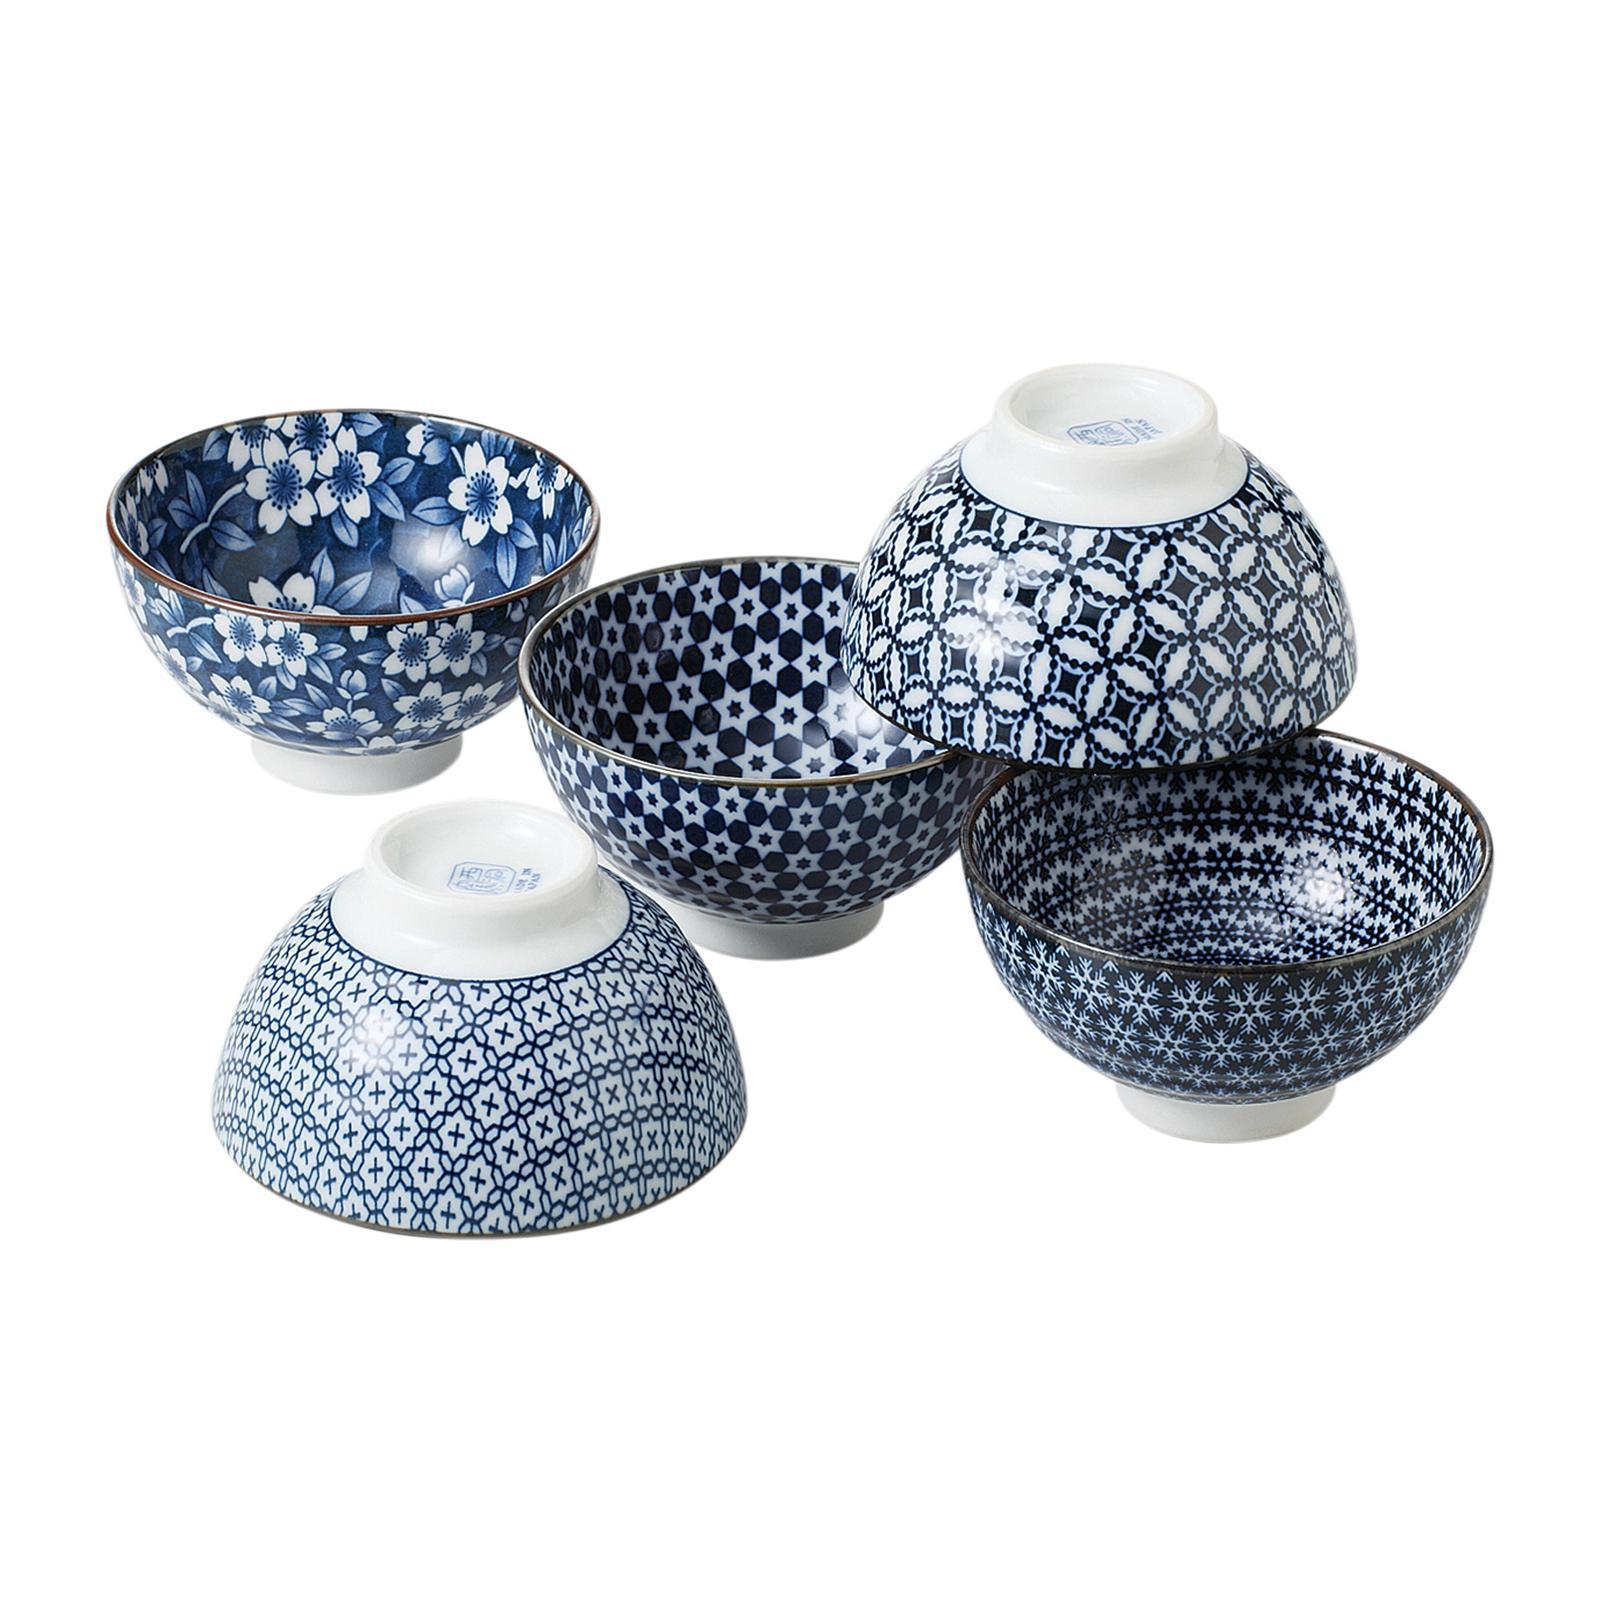 Tsuru 78 - 54 - 45 5 PCS Rice Bowl Set